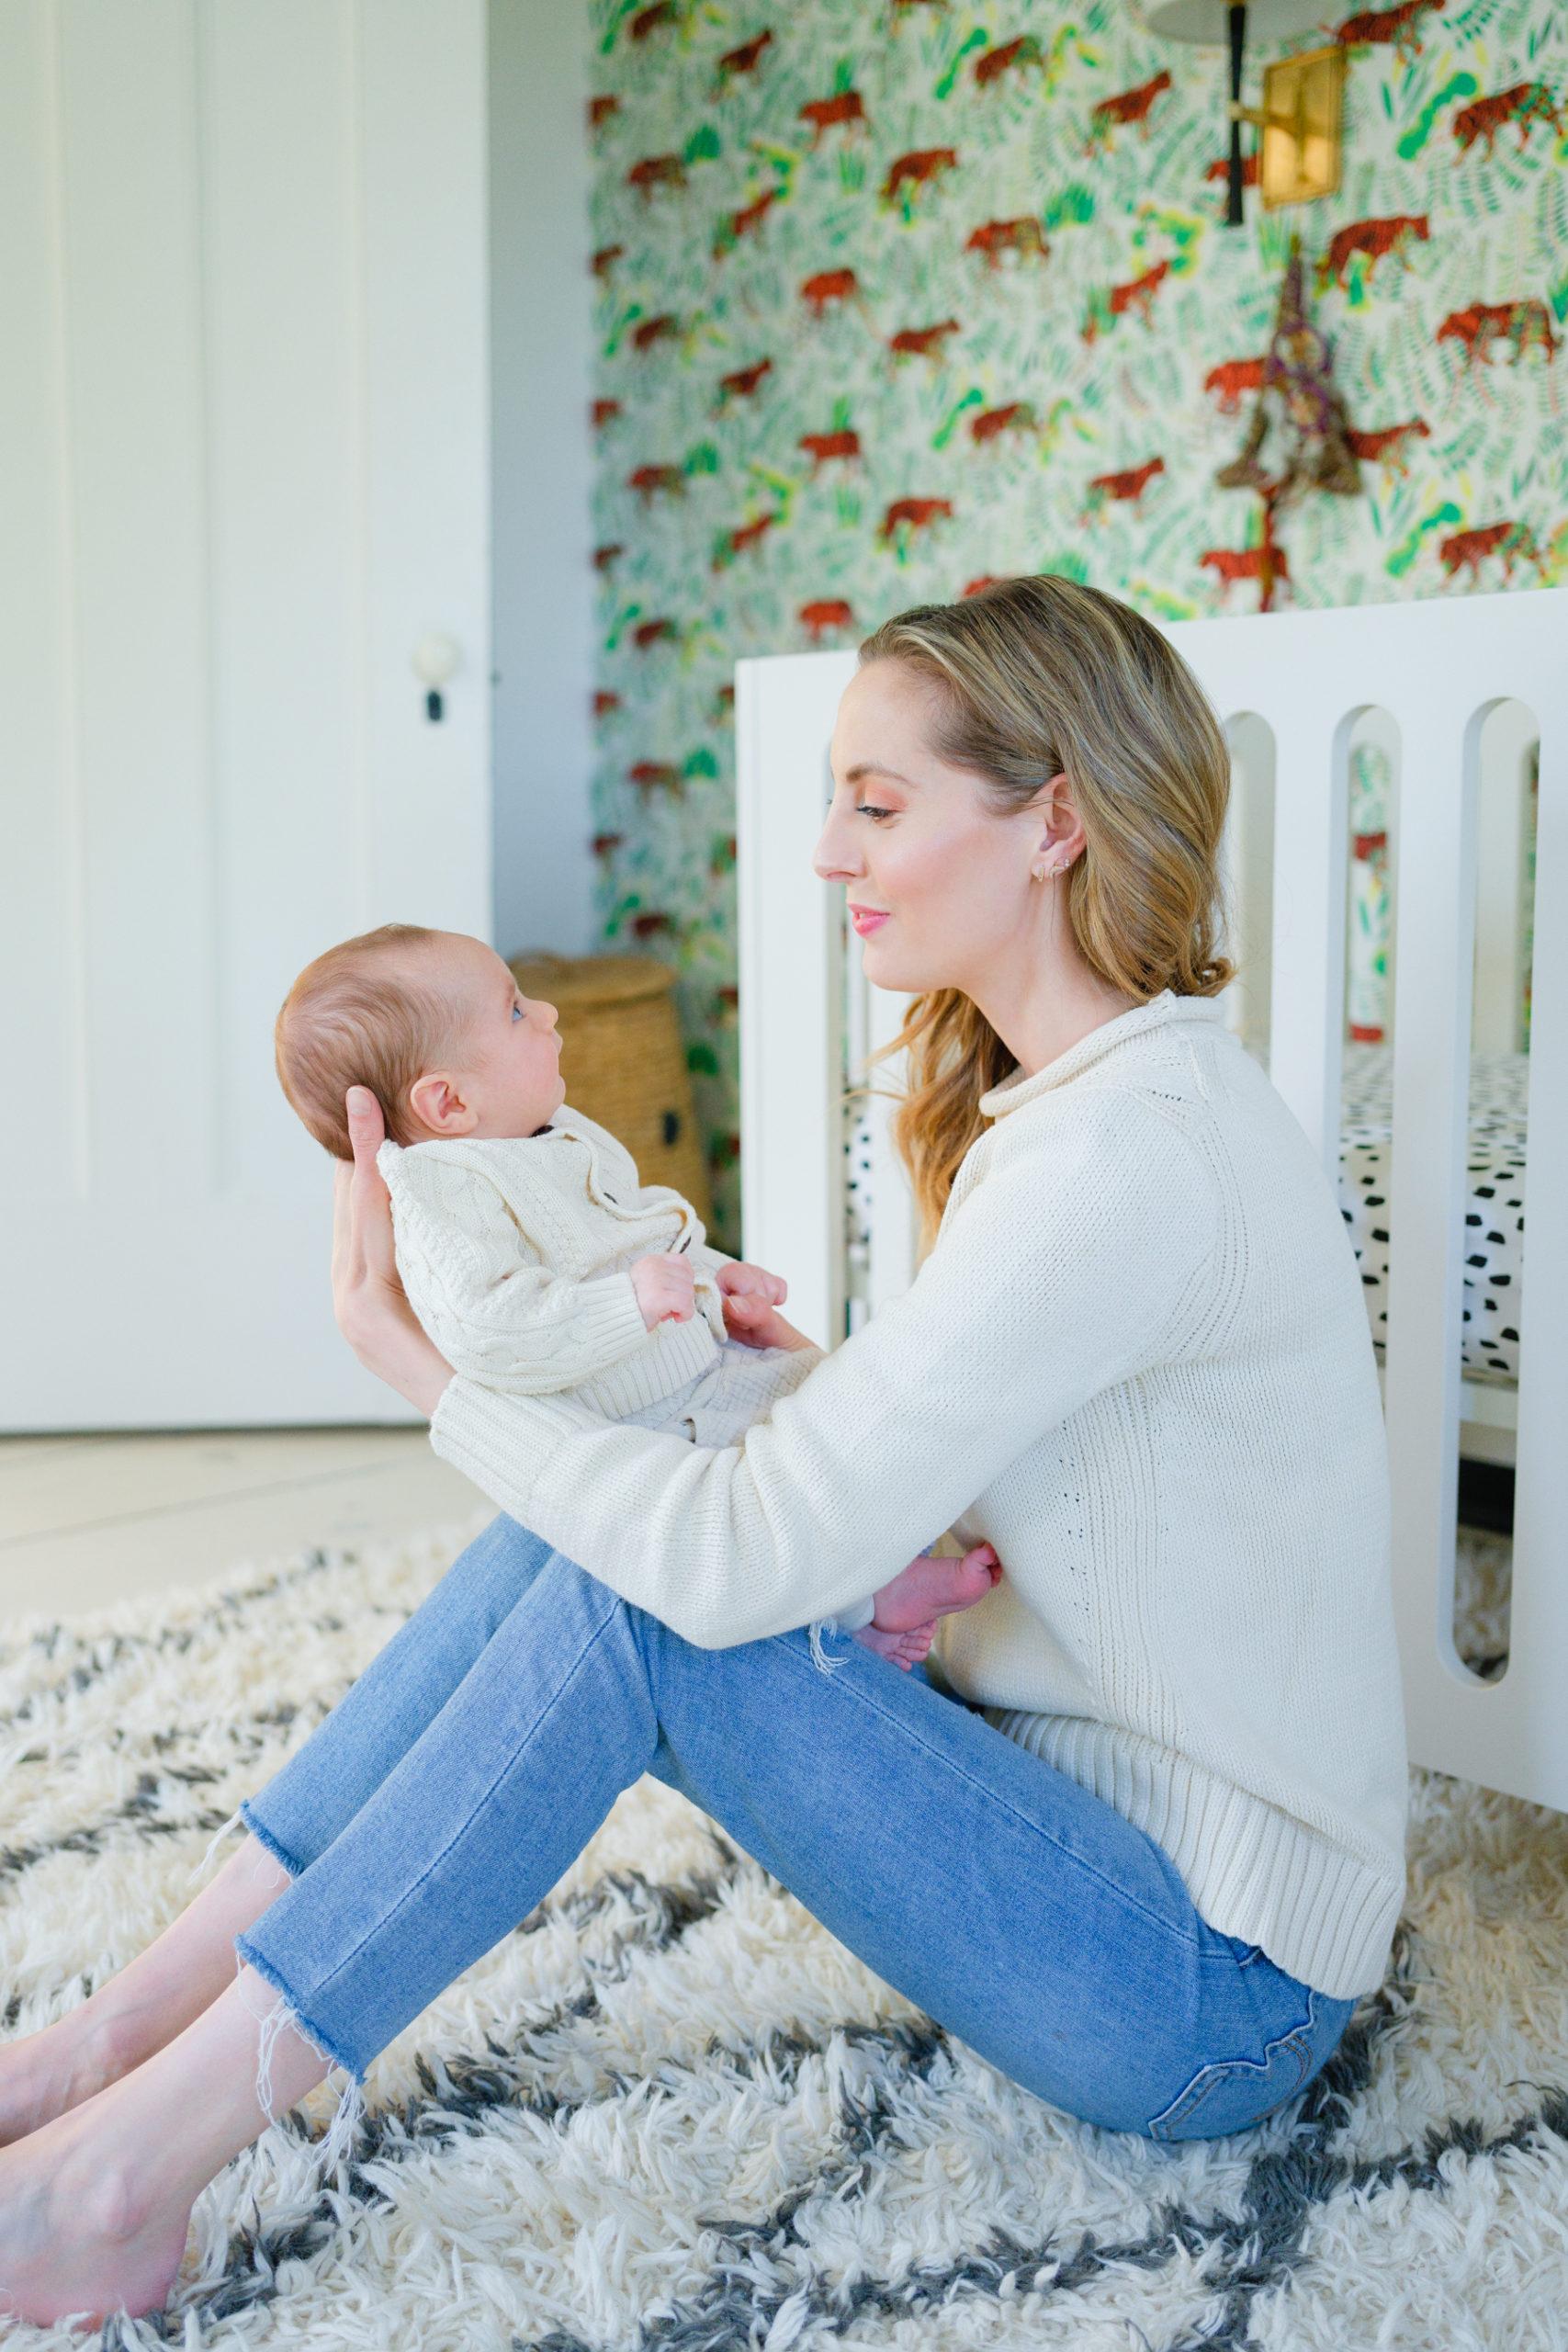 Eva Amurri shares her son Mateo's updated nursery